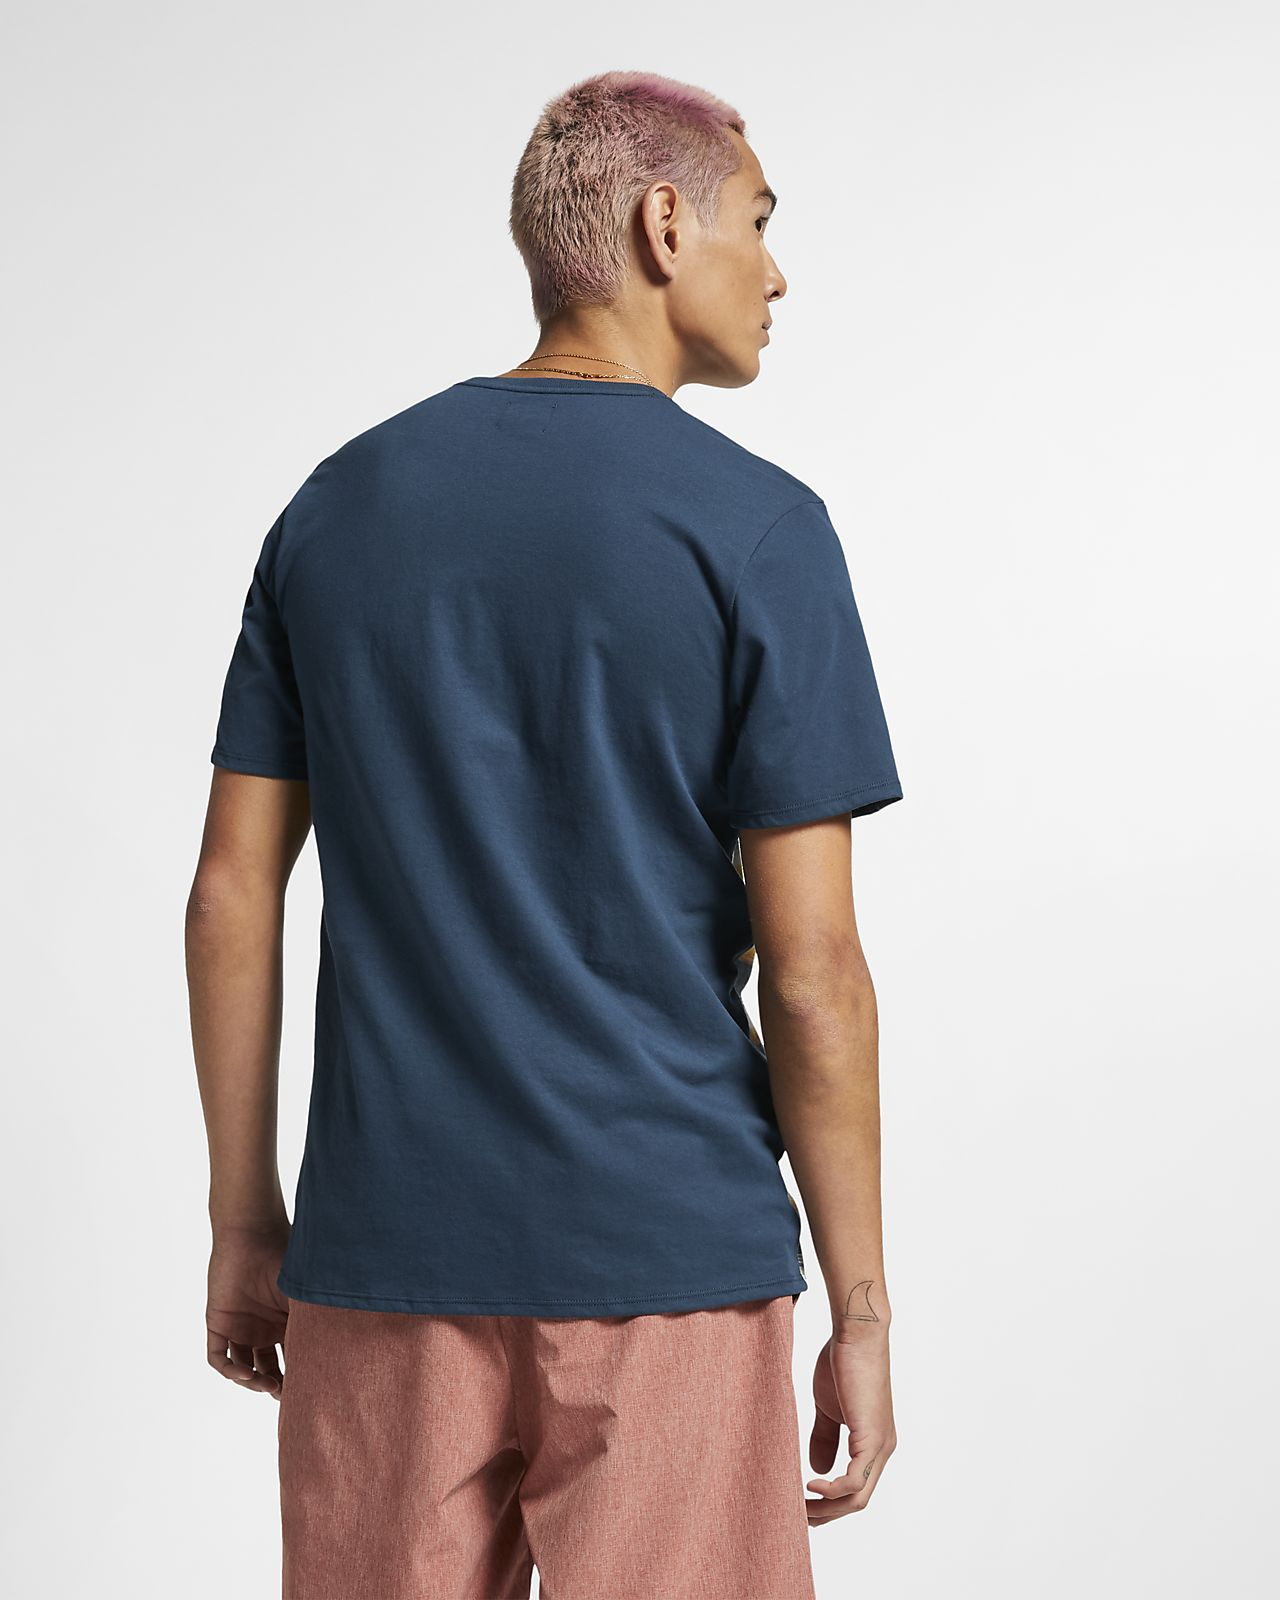 4fe55c13 Hurley Dri-FIT Harvey Serape Men's Short-Sleeve Shirt. Nike.com